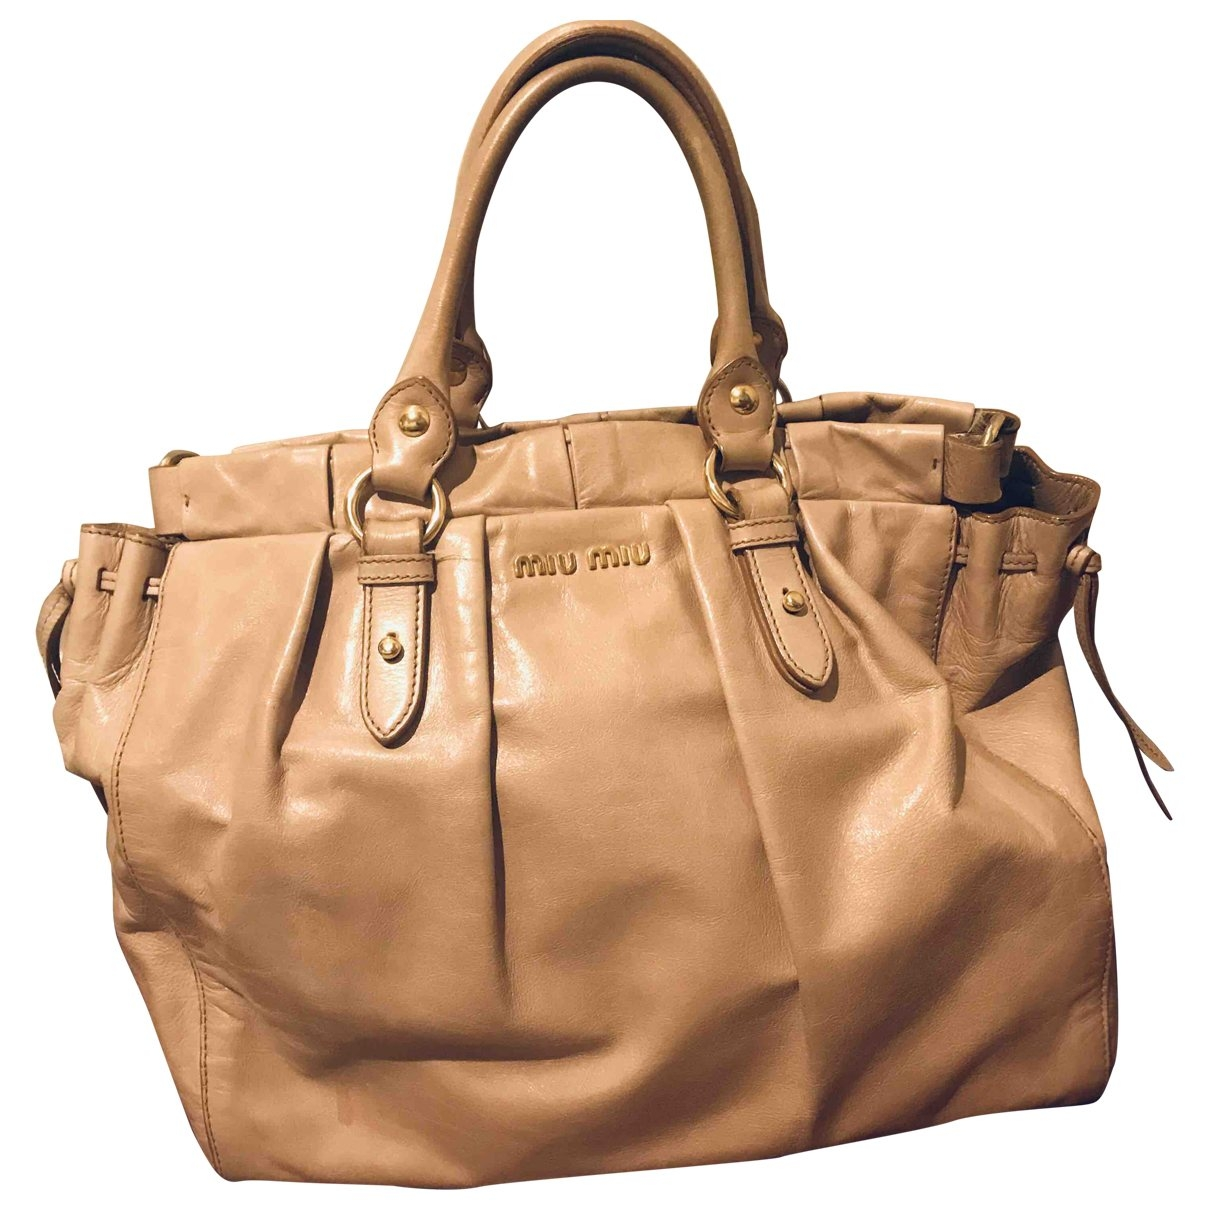 Miu Miu Bow bag Pink Leather handbag for Women \N